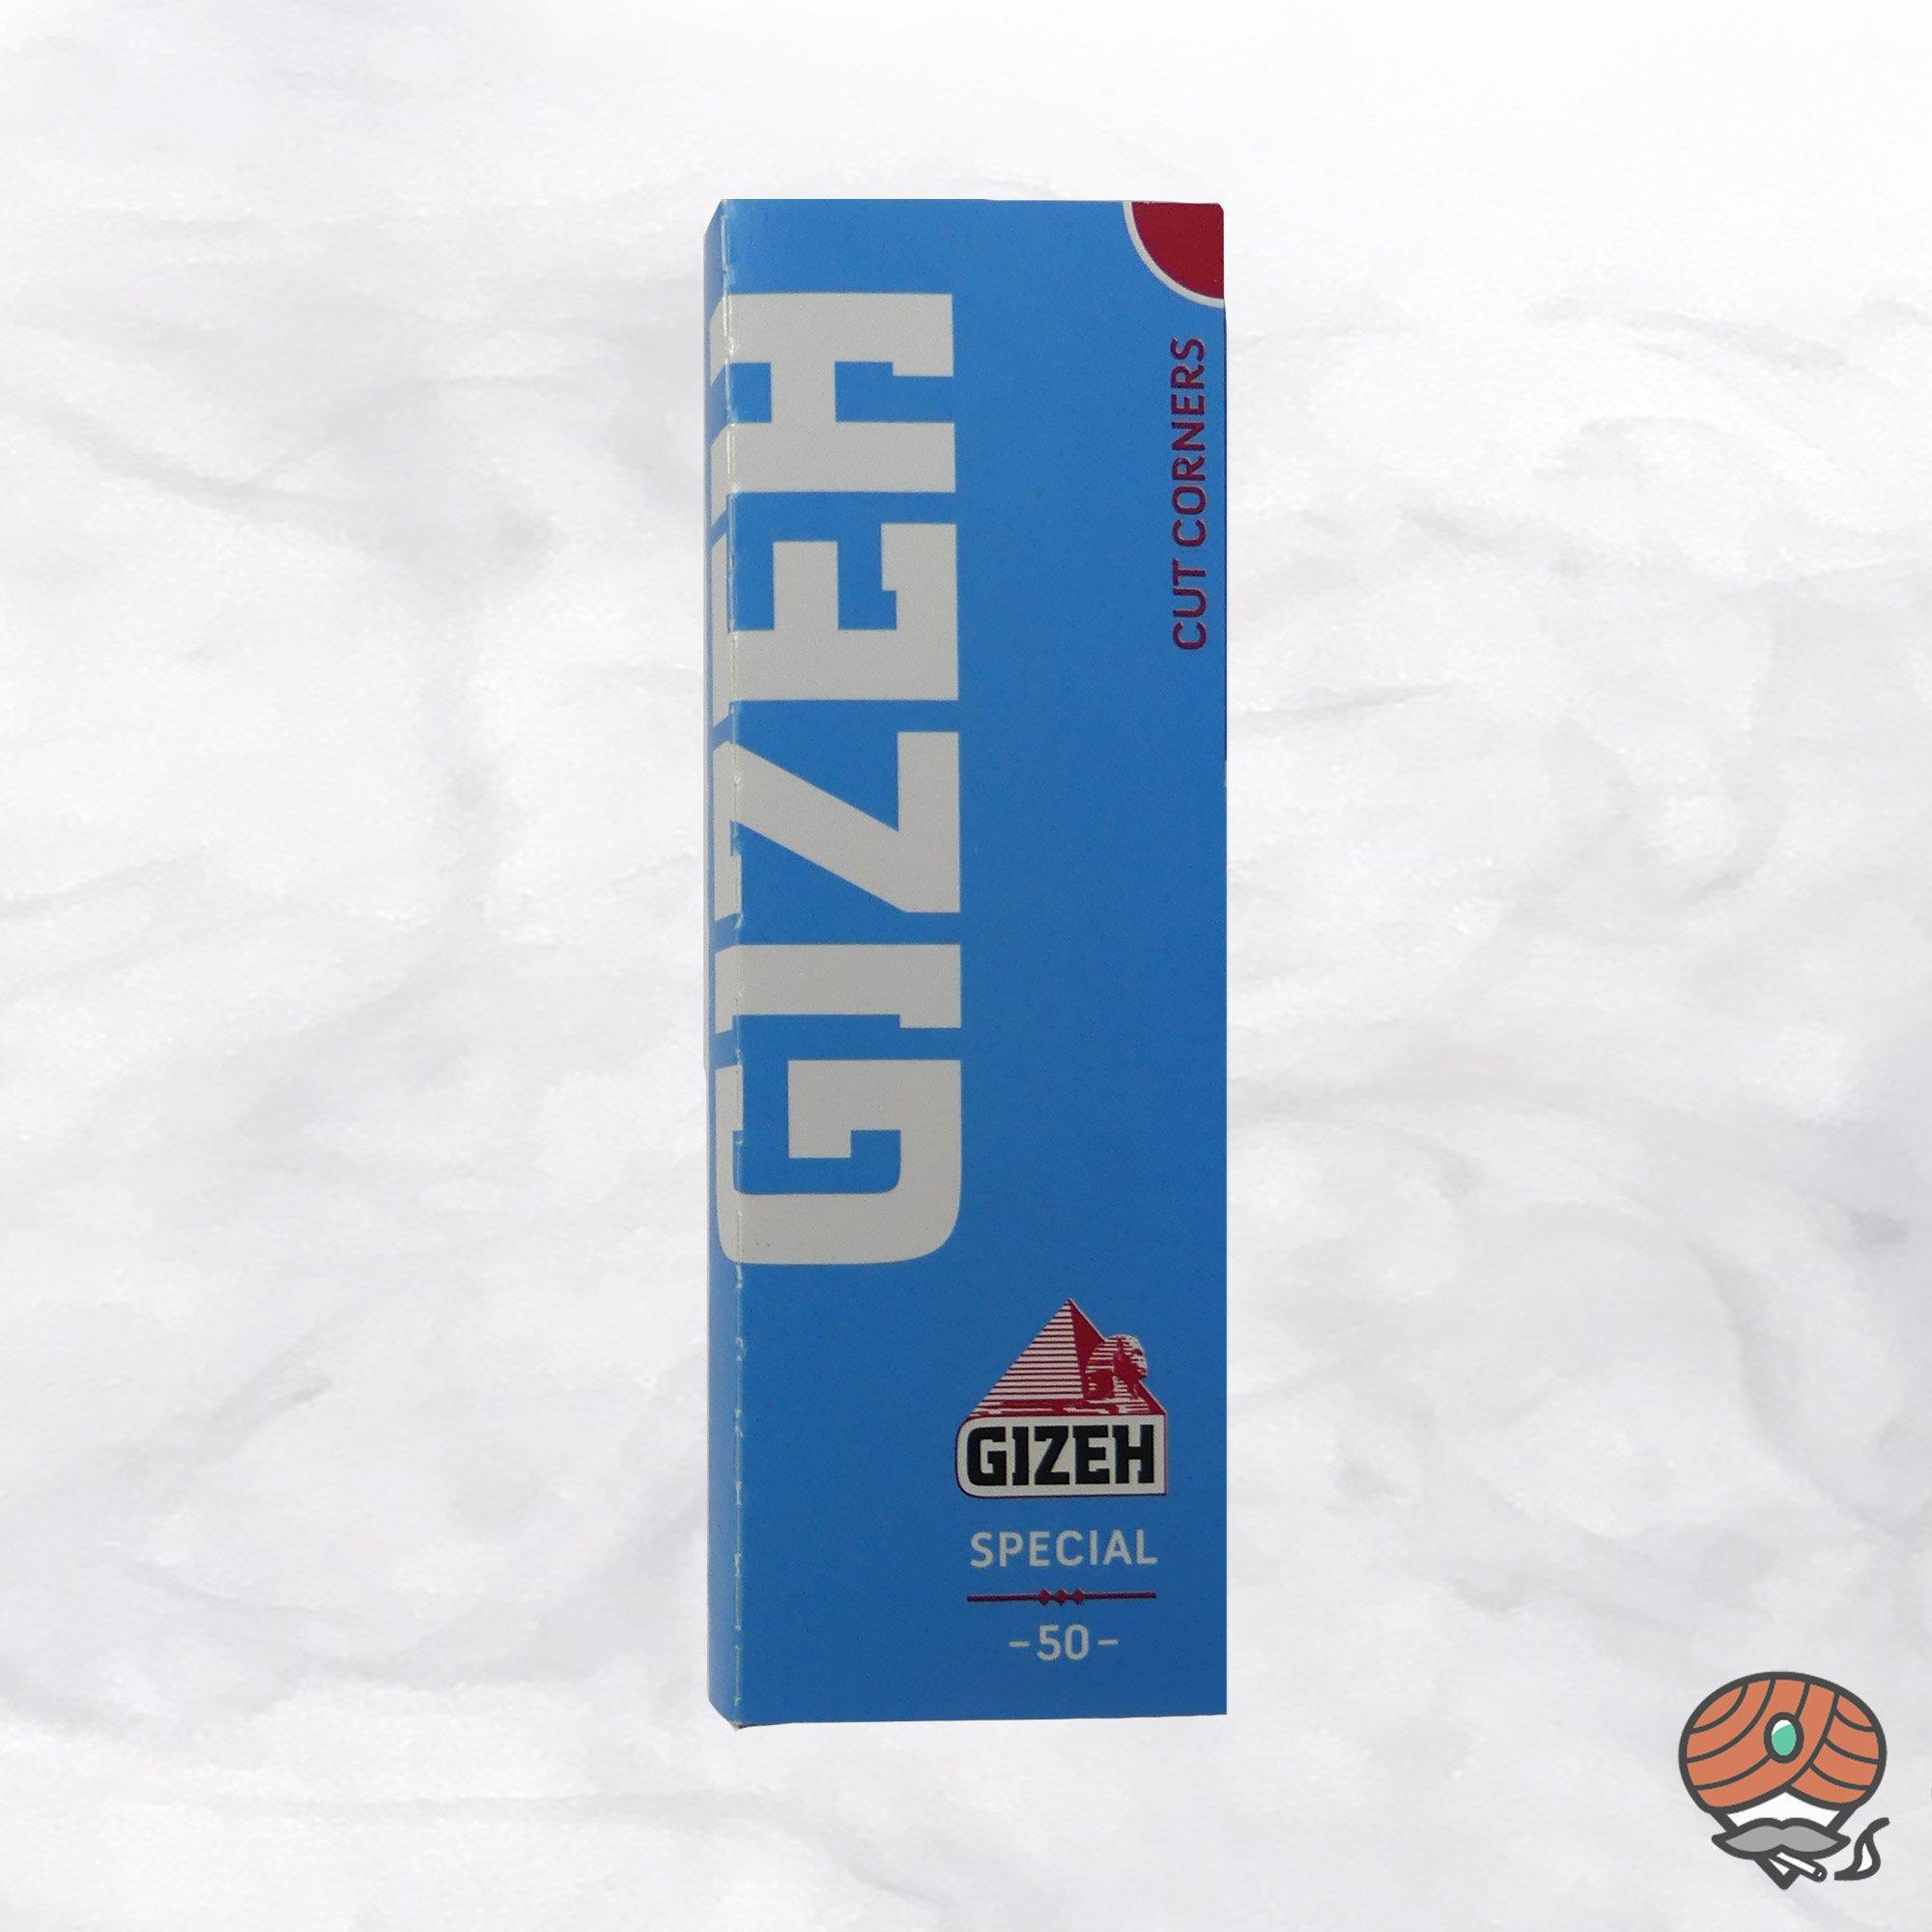 Gizeh Special Blau Blättchen à 50 Blatt